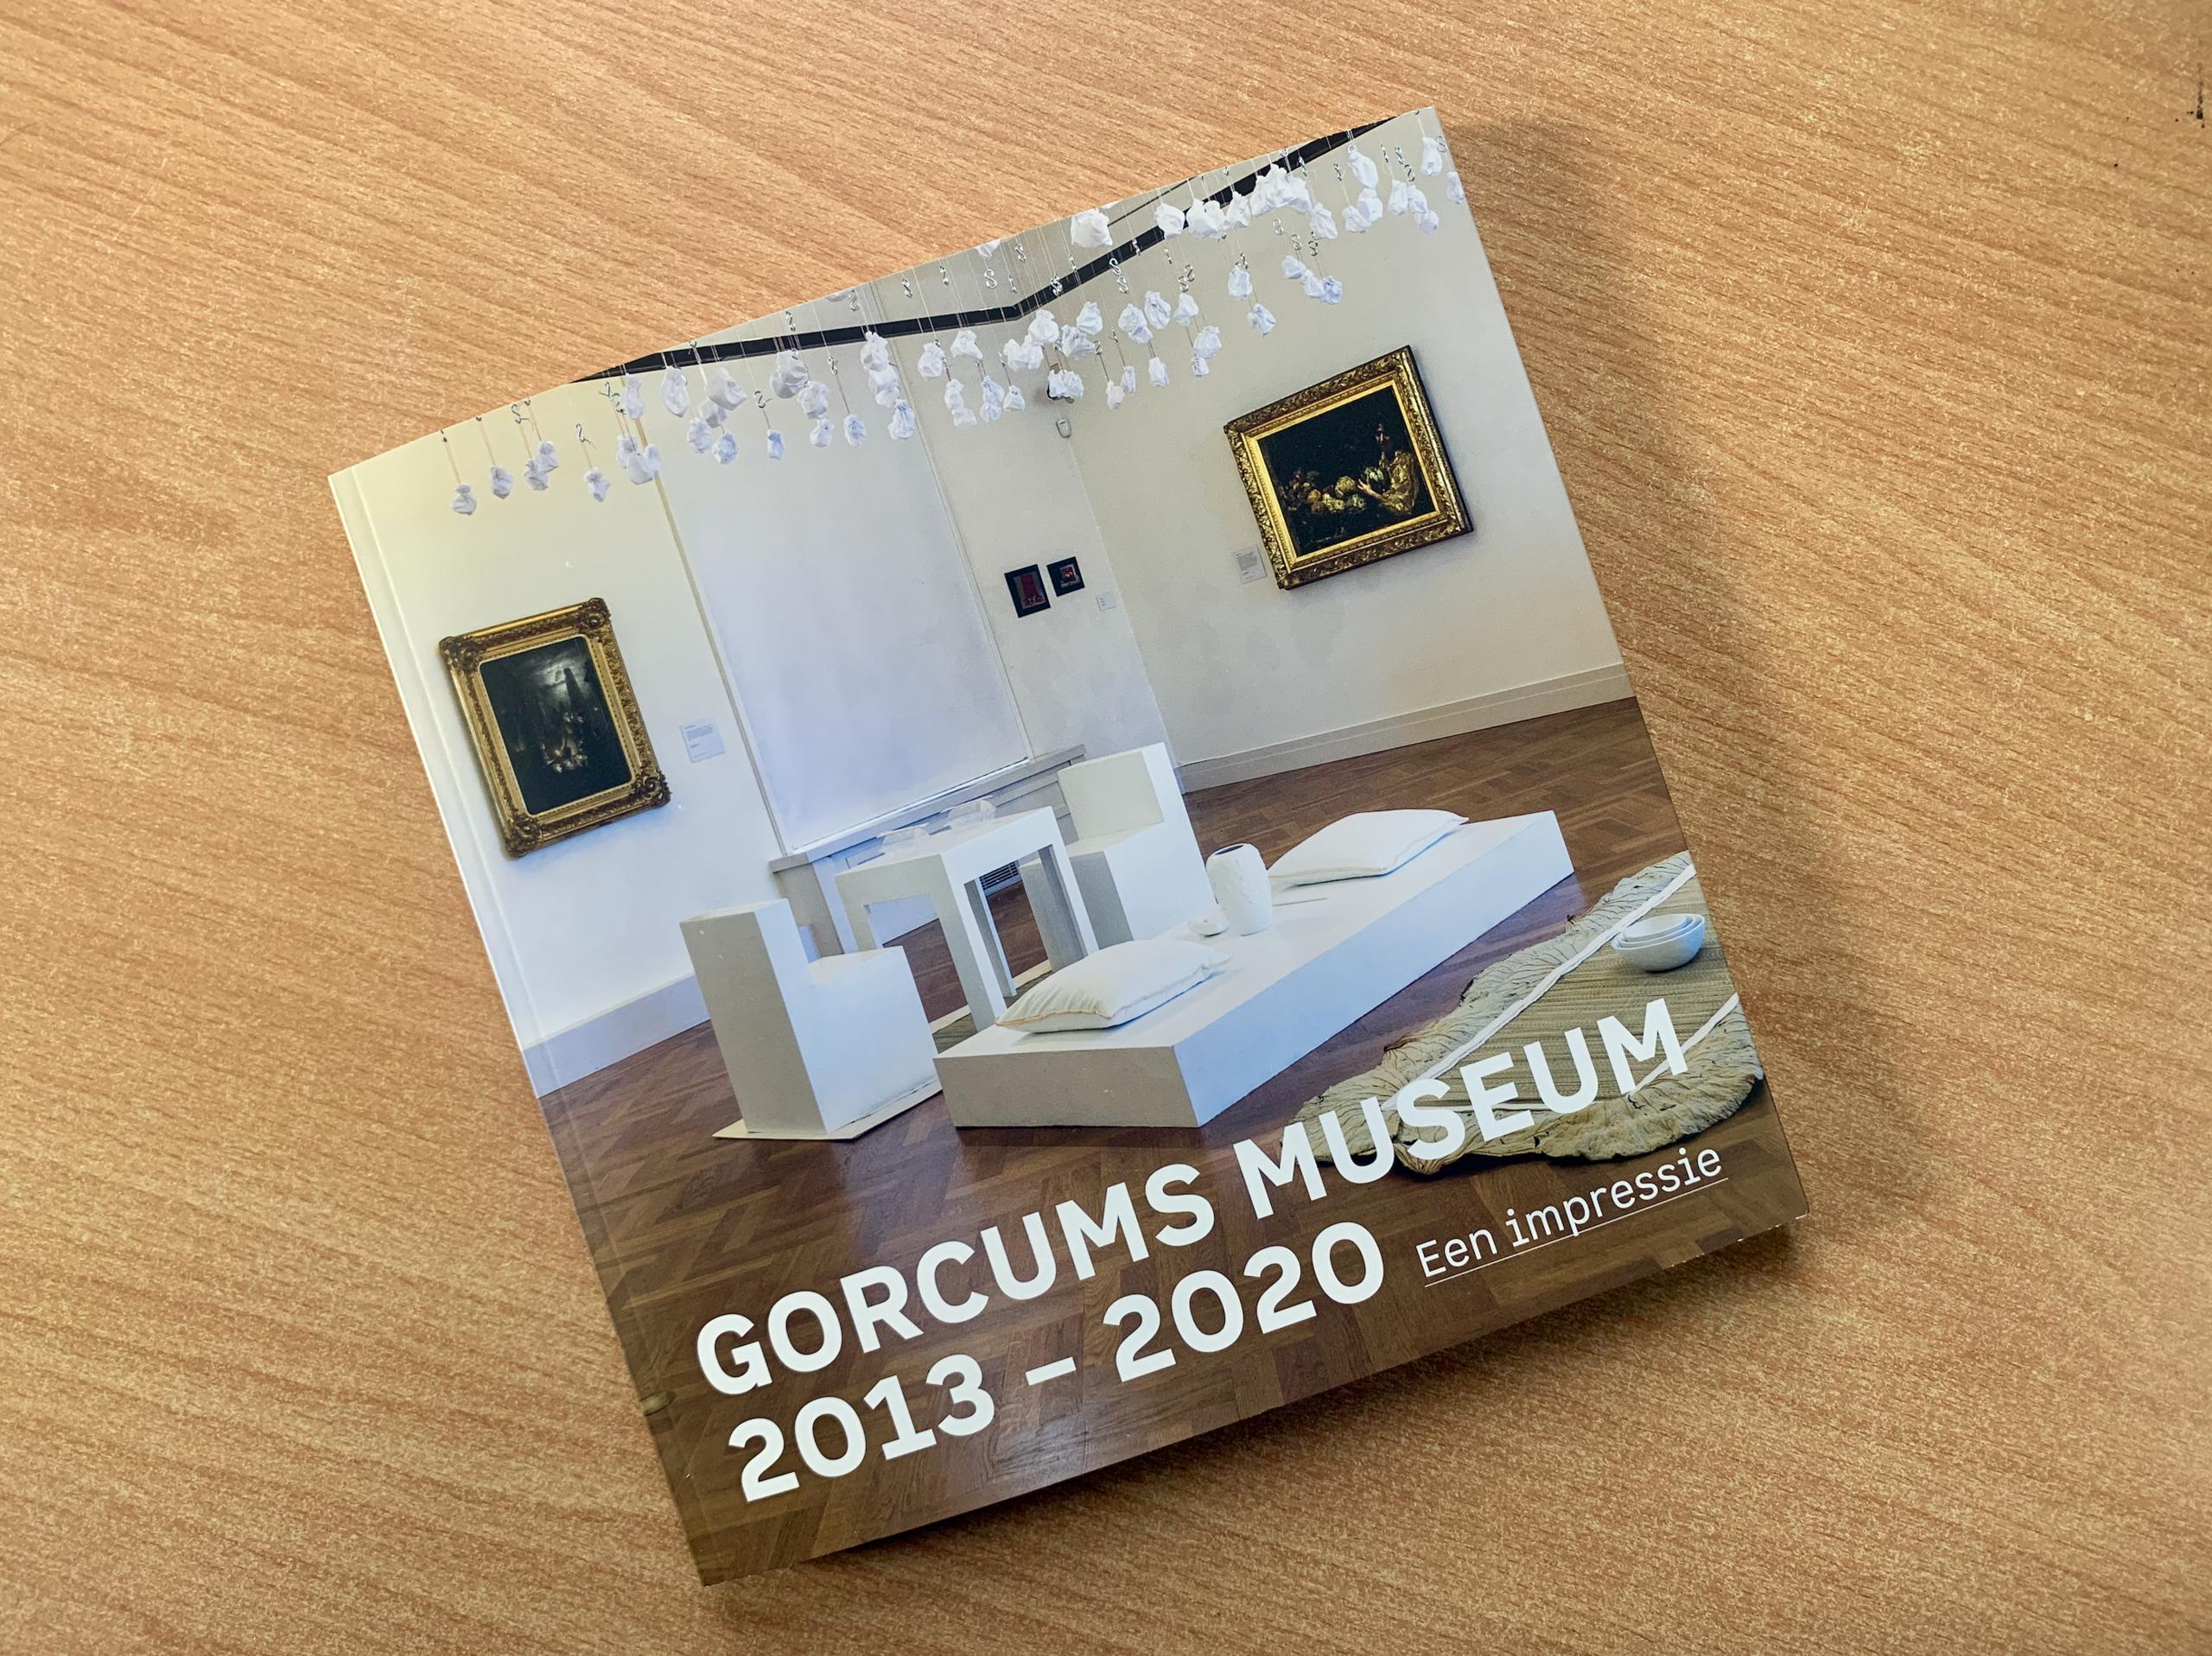 Boek Gorcums Museum 2013 - 2020